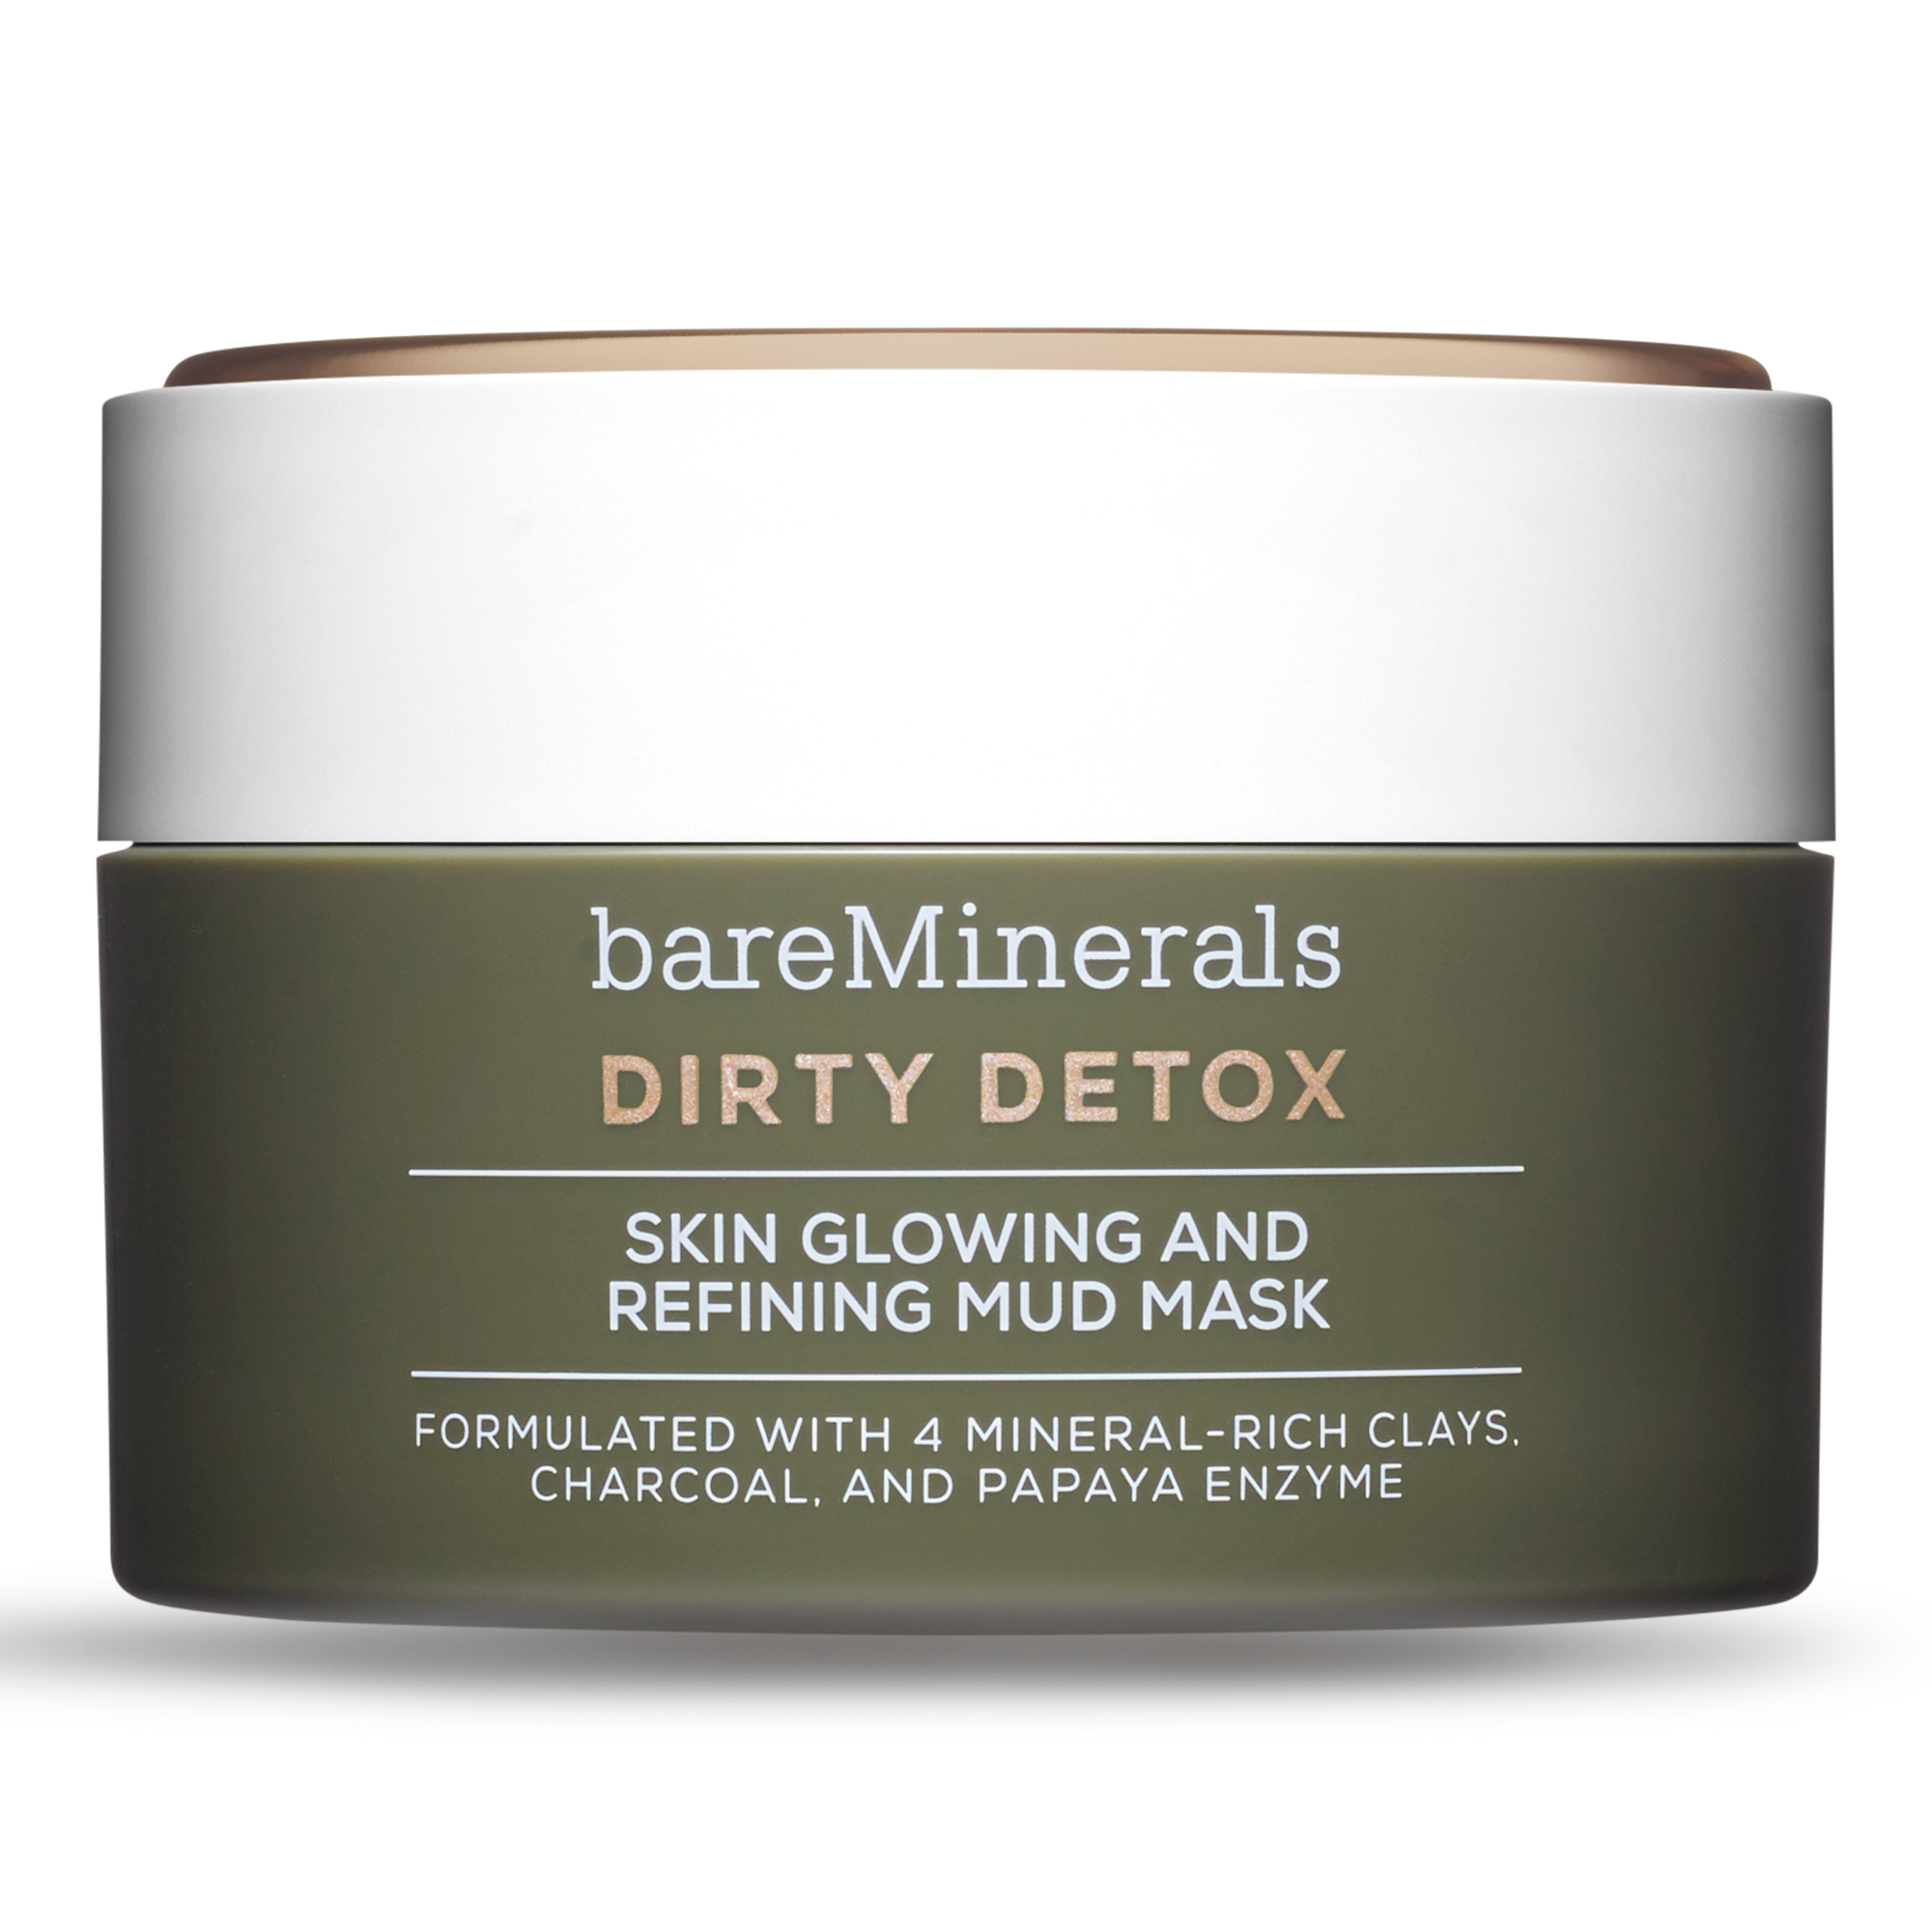 Dirty Detox  - Skin Glowing and Refining Mud Mask